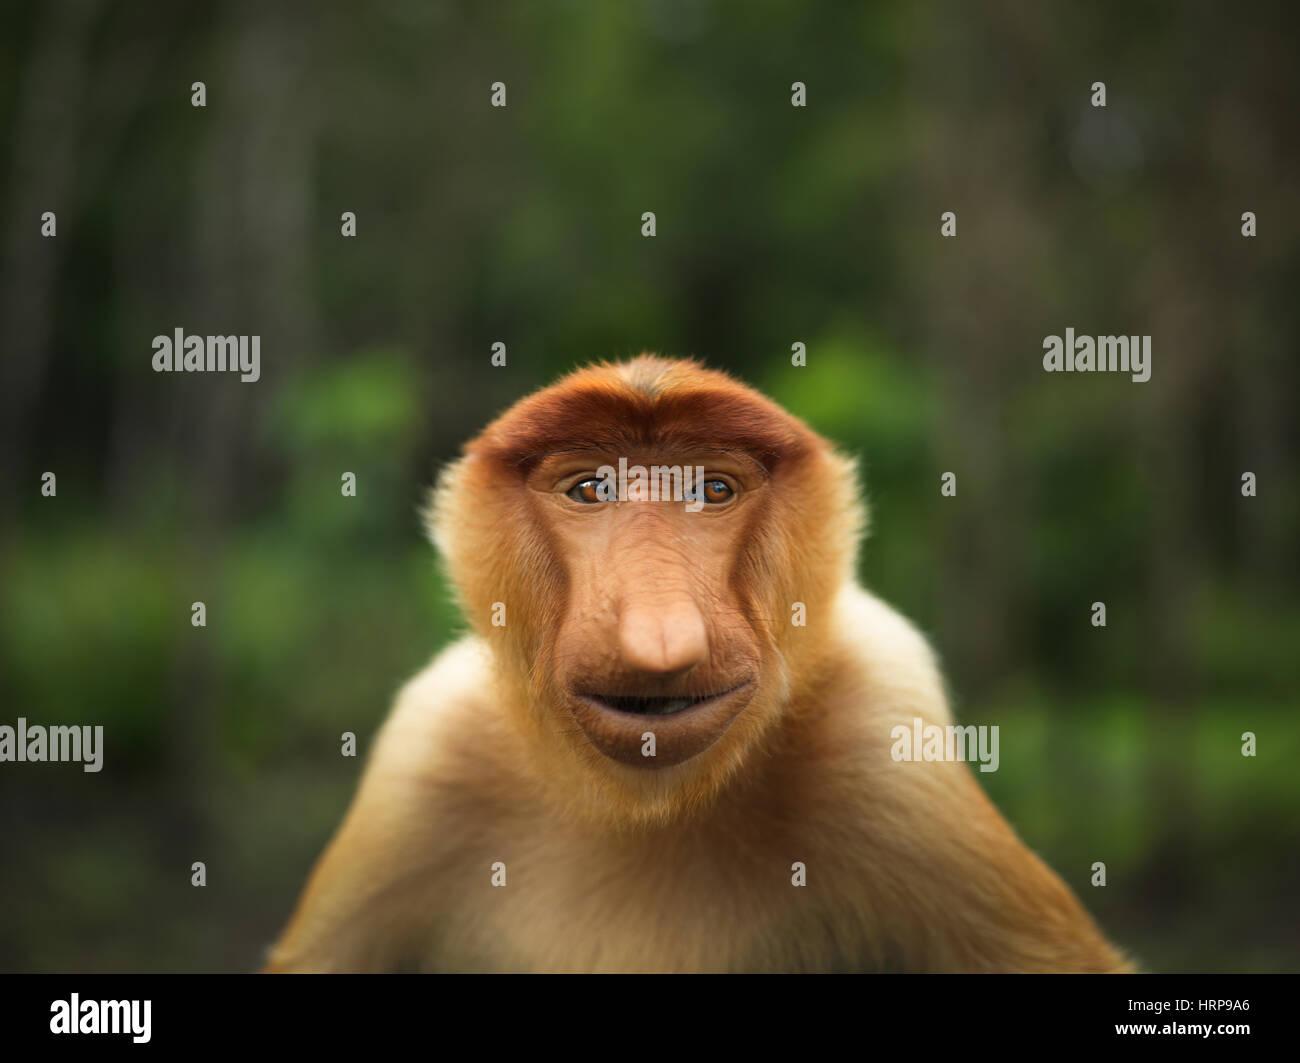 Nasalis larvatus, Long-nosed monkey, Malaysia, Indonesia, Asia, Borneo, Kalimantan - Stock Image